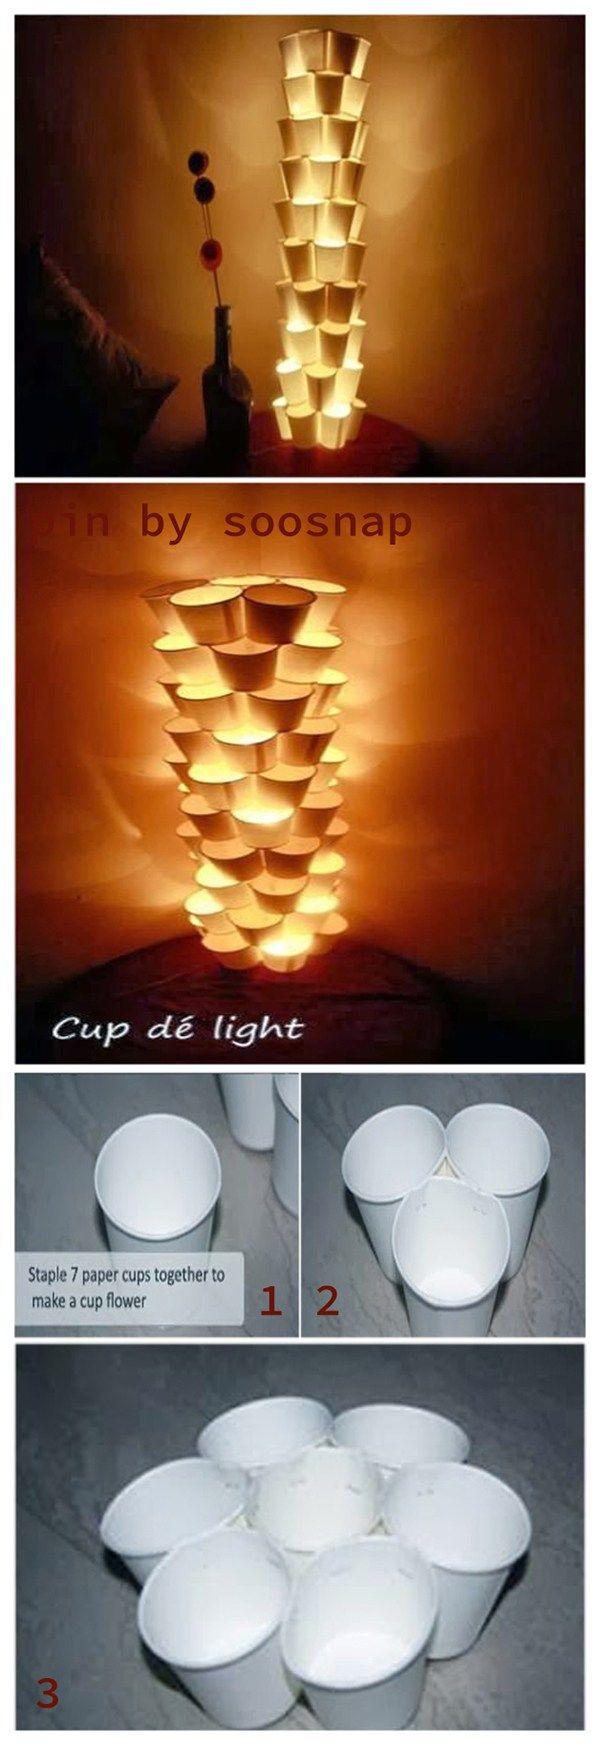 20+White Paper Lamps Ideas